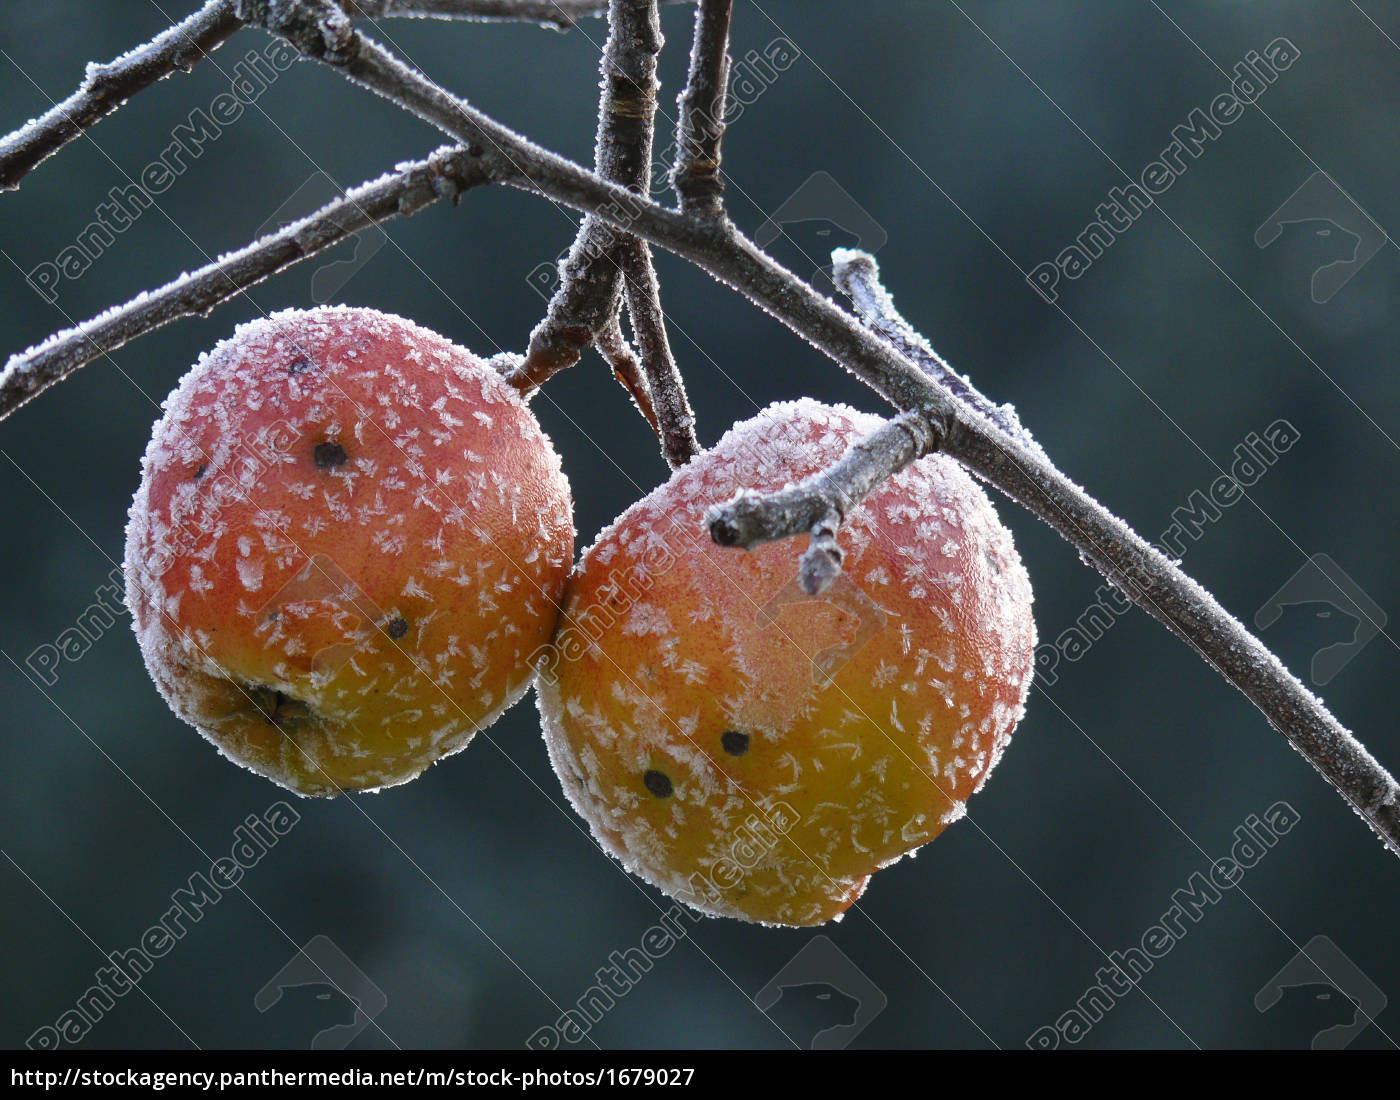 frost, apple - 1679027